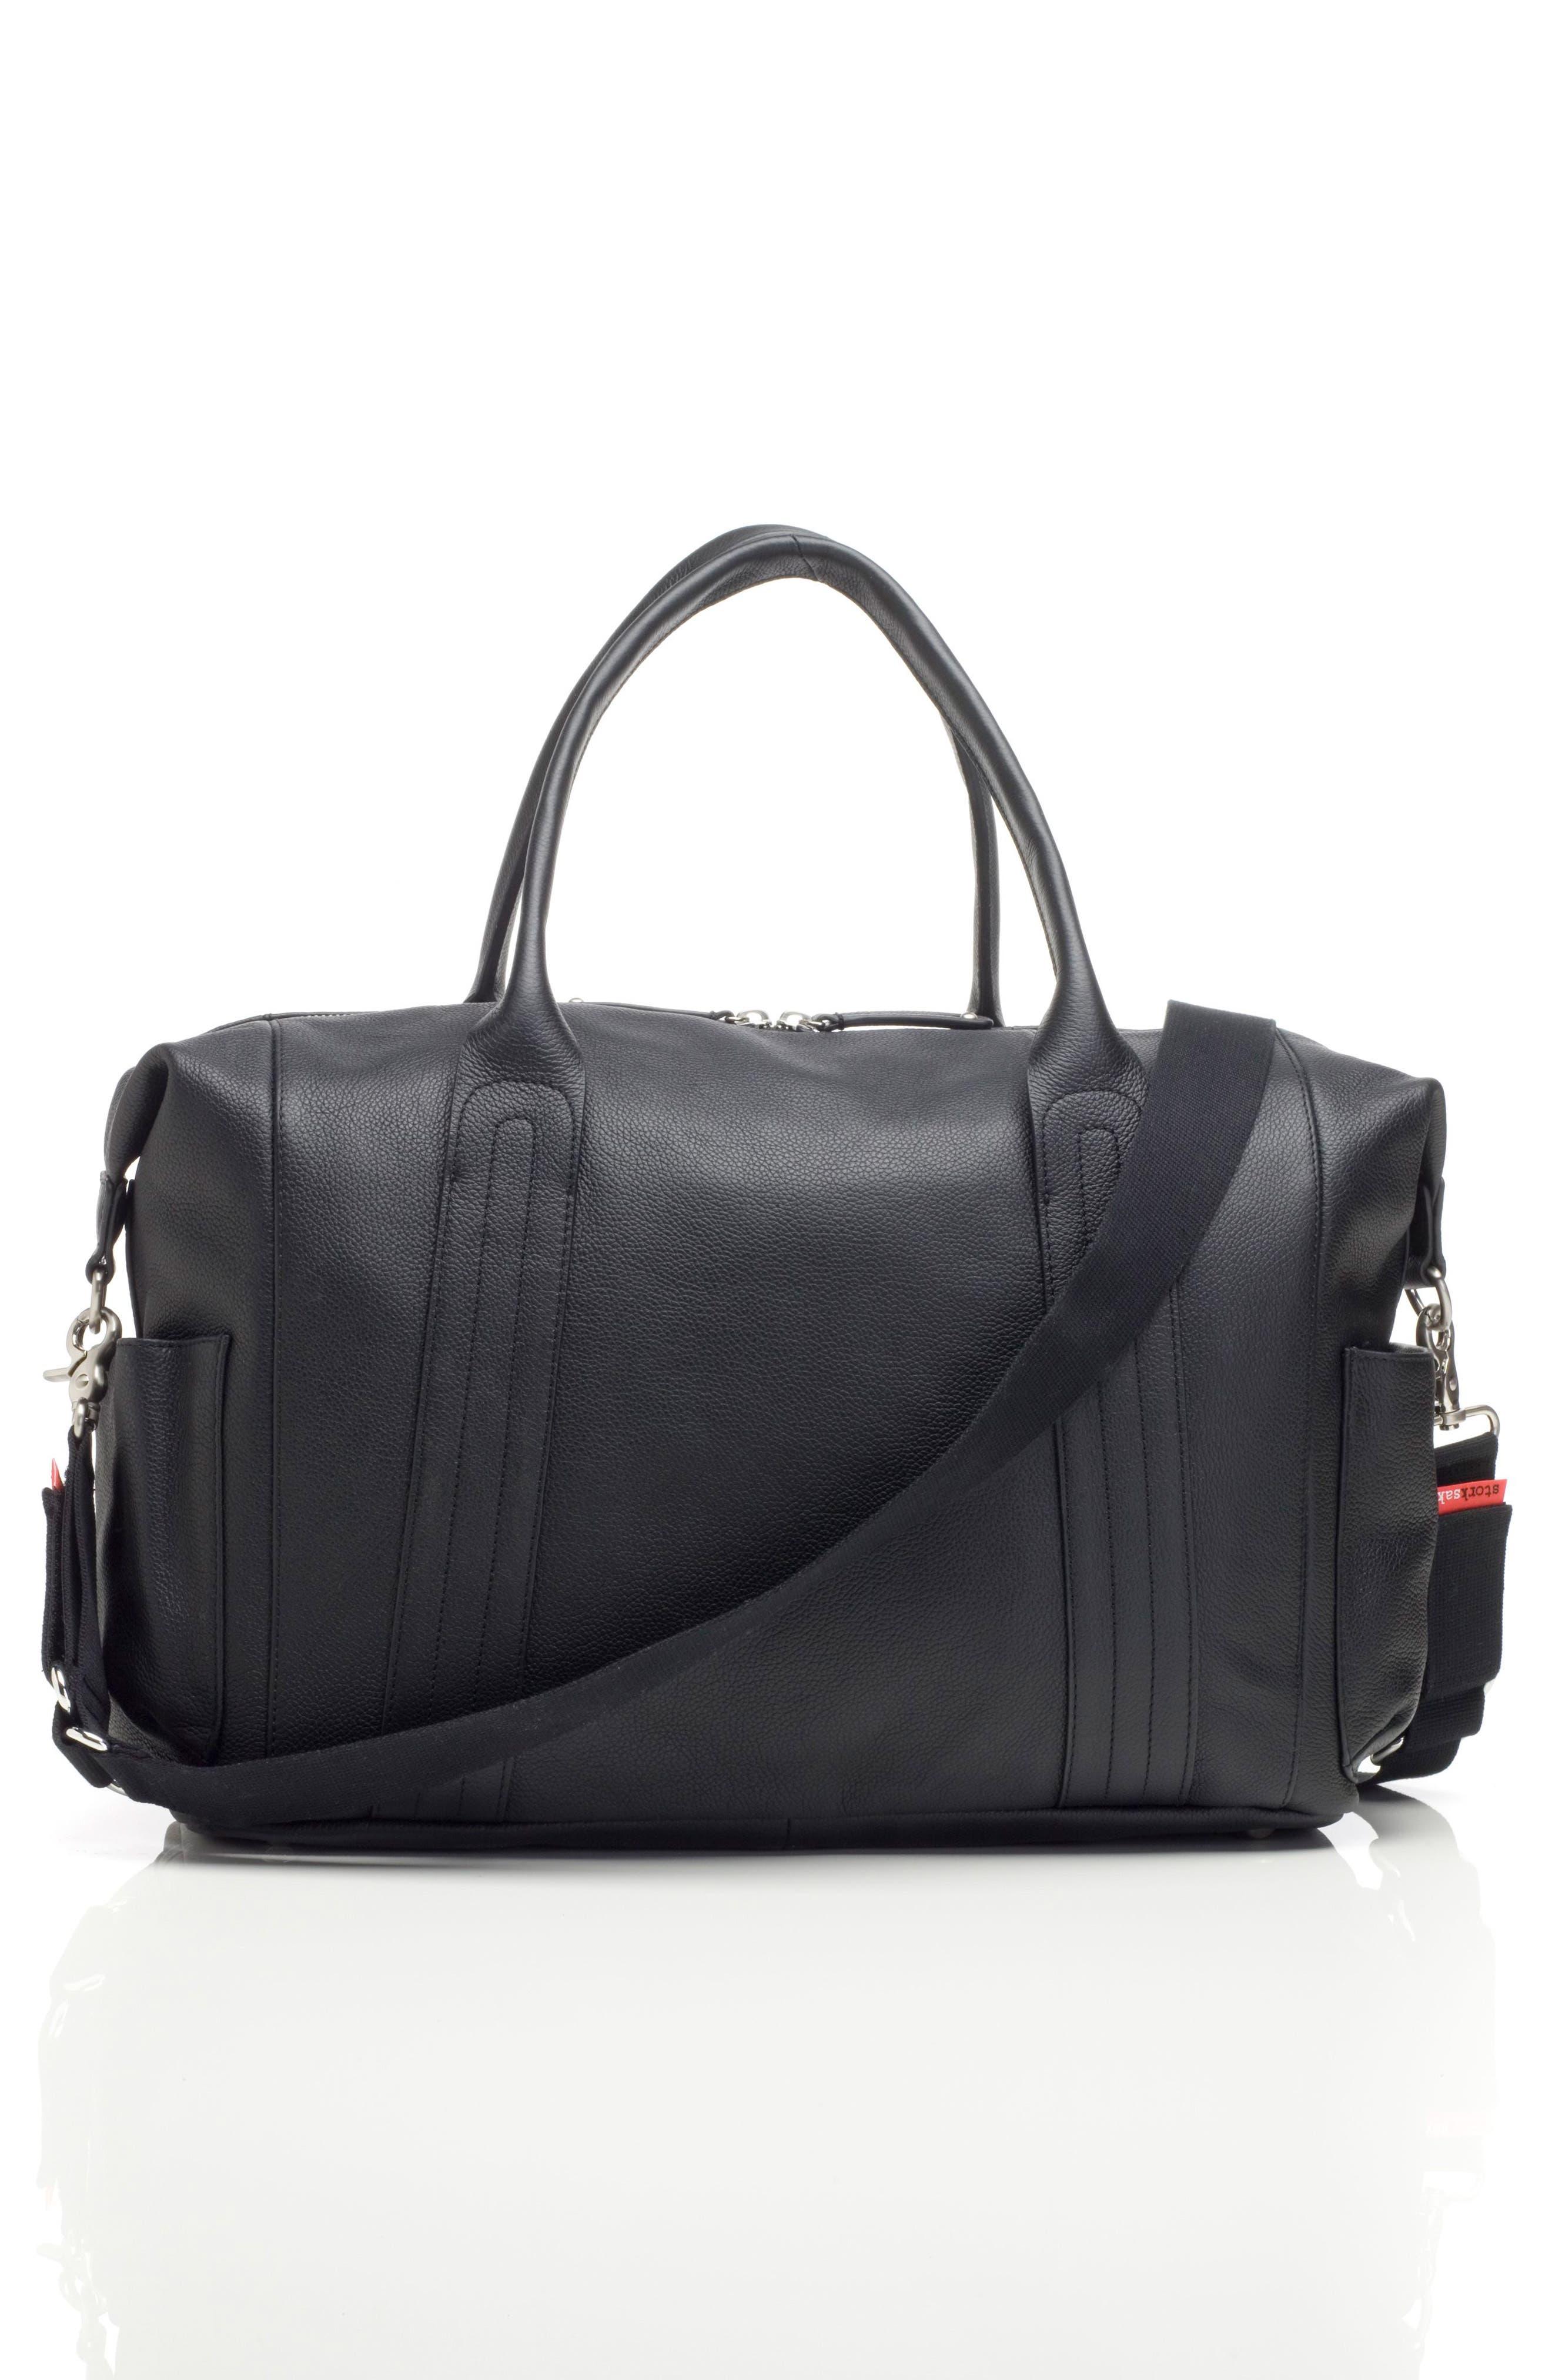 Storsak Leather Diaper Bag,                             Alternate thumbnail 3, color,                             BLACK